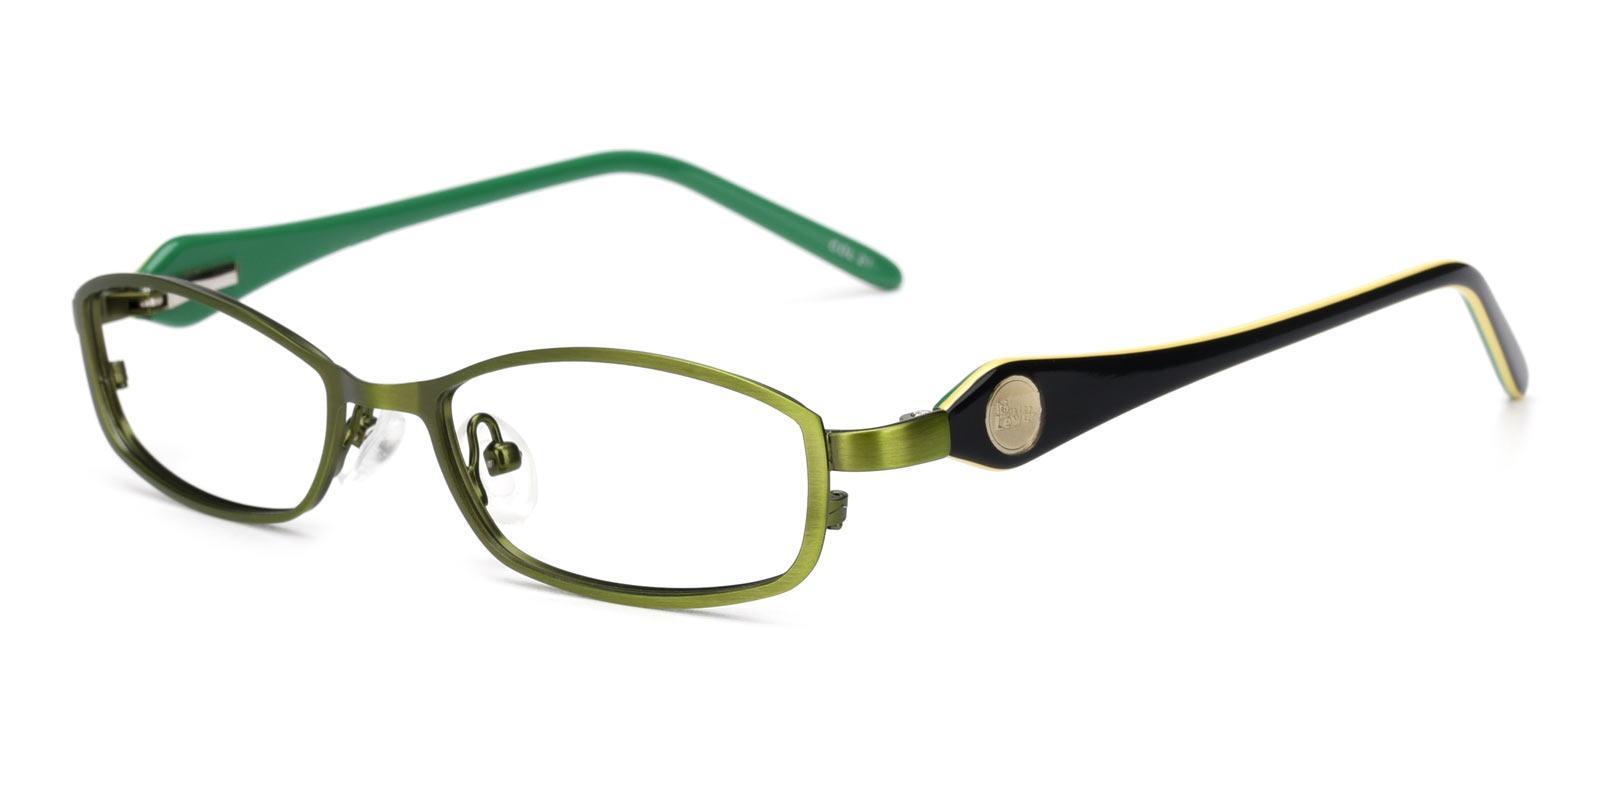 Astronaut-Green-Rectangle-Metal-Eyeglasses-detail